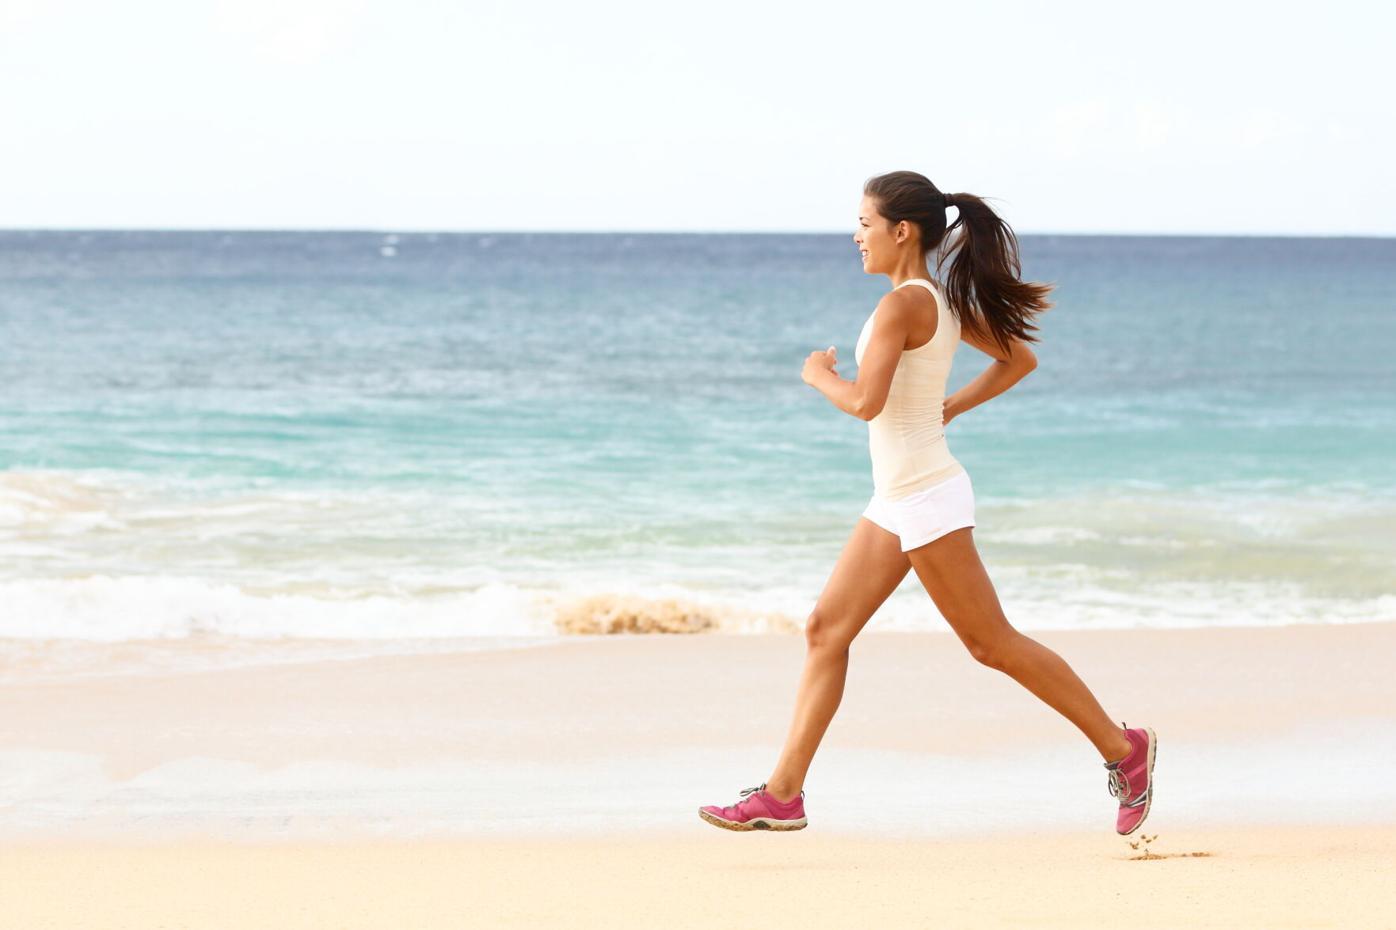 Walking has lot of benefits